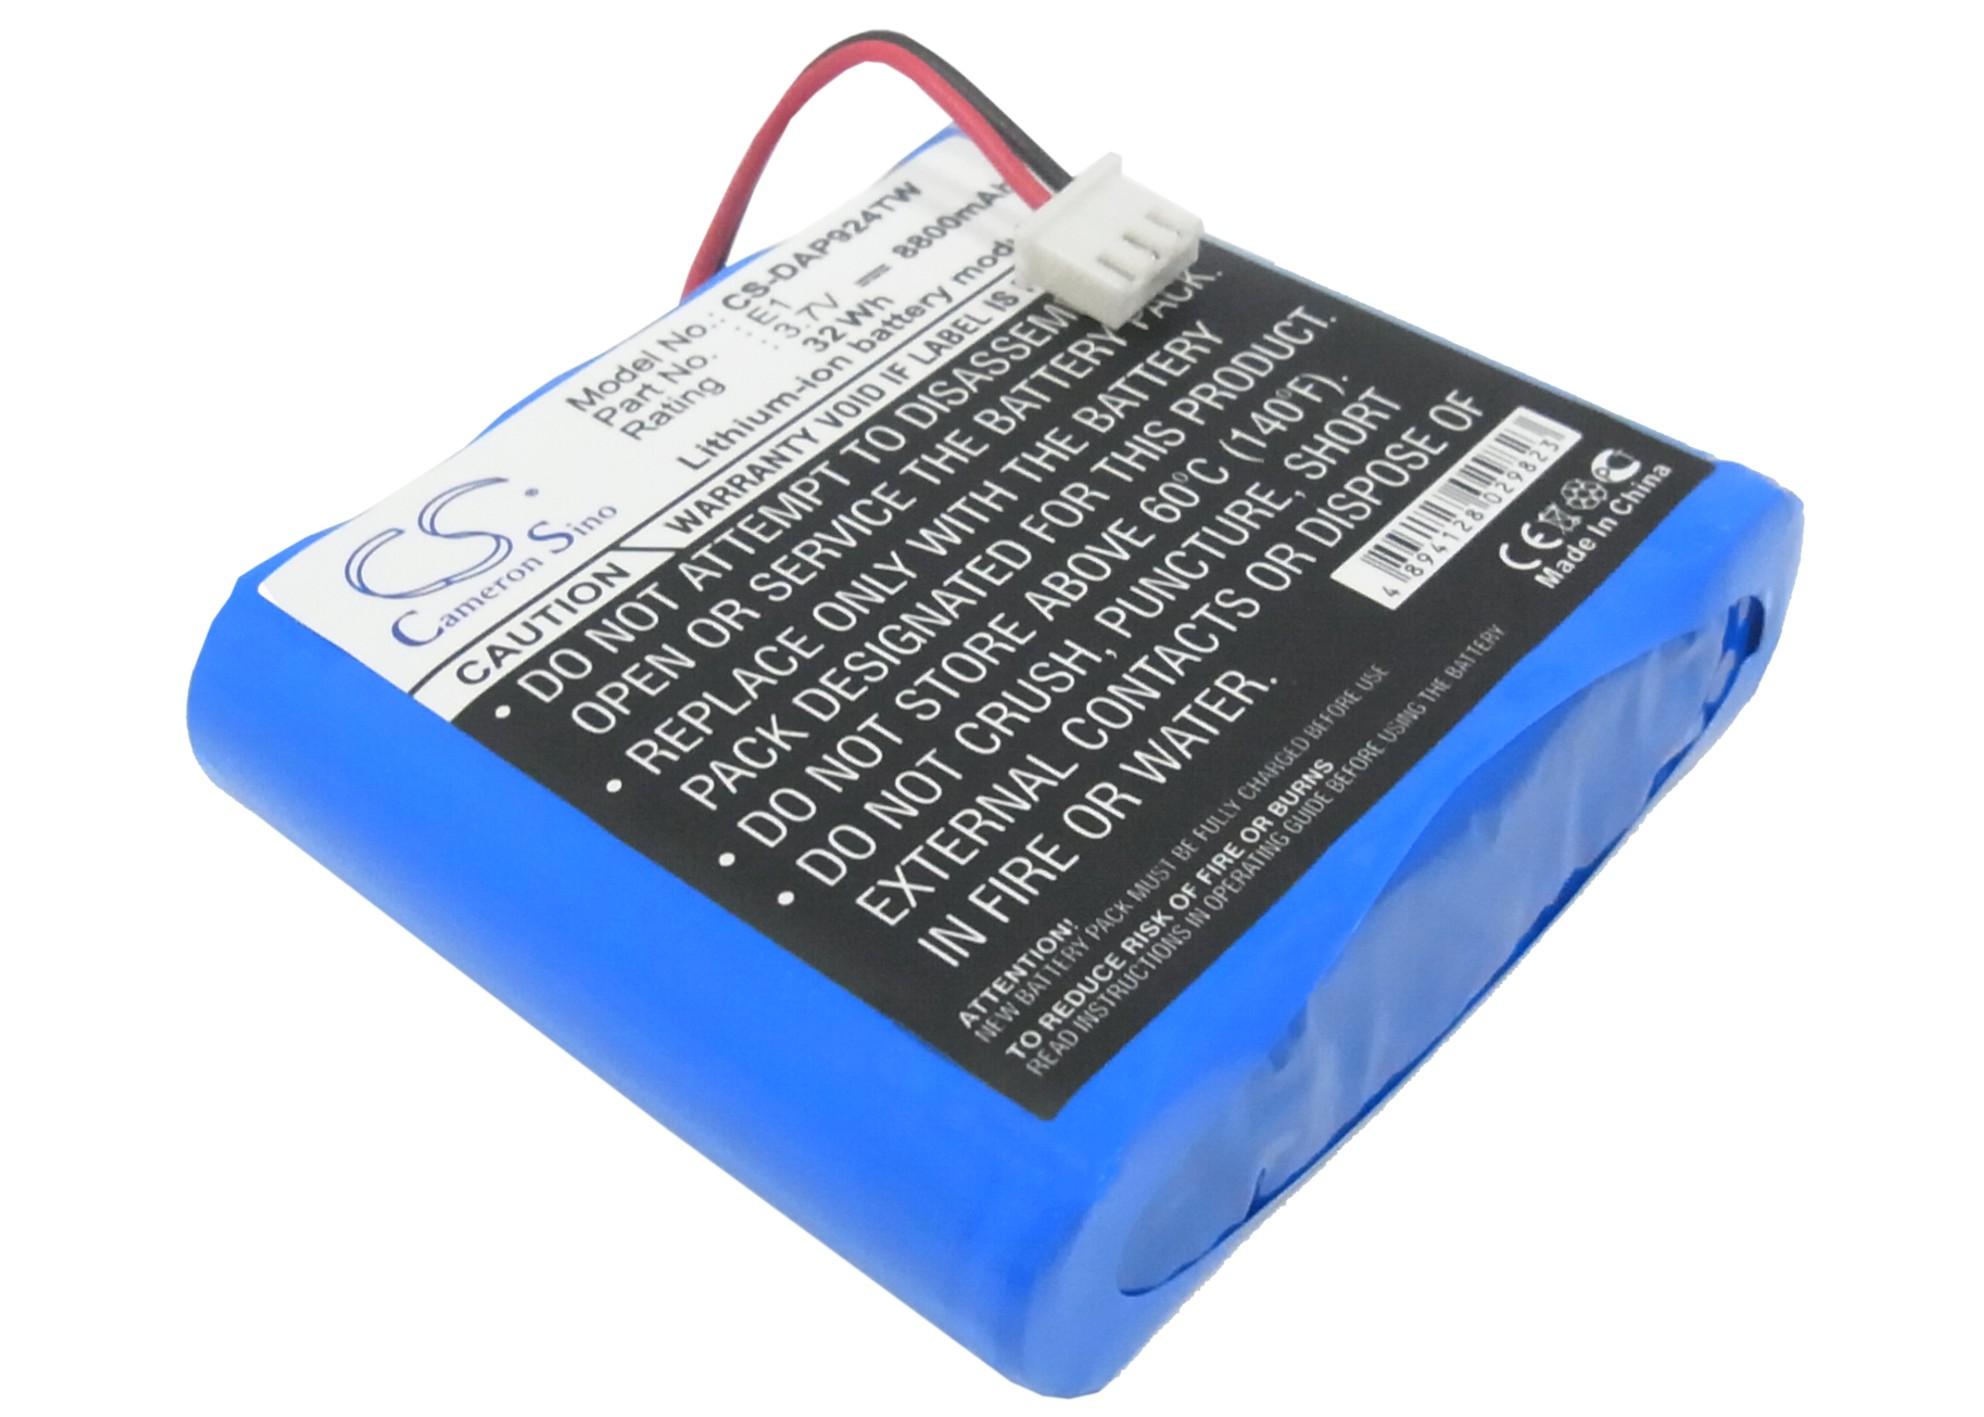 Cameron Sino baterie do digitálních rádií pro PURE Evoke Mio 3.7V Li-ion 8800mAh modrá - neoriginální